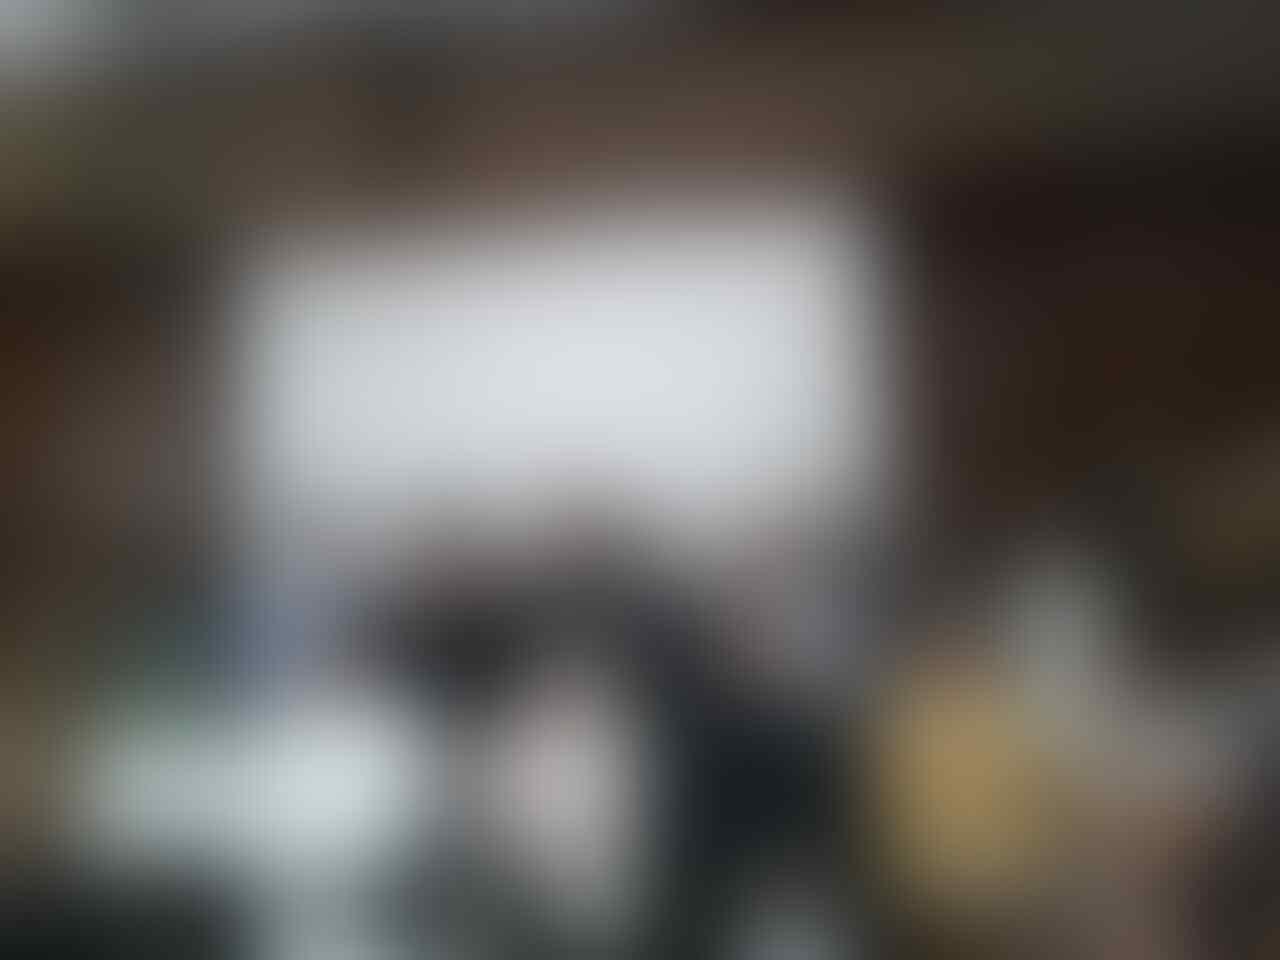 Tokoh Nasional Berkumpul Lawan Terorisme, Shinta Wahid sampai Azyumardi Azra